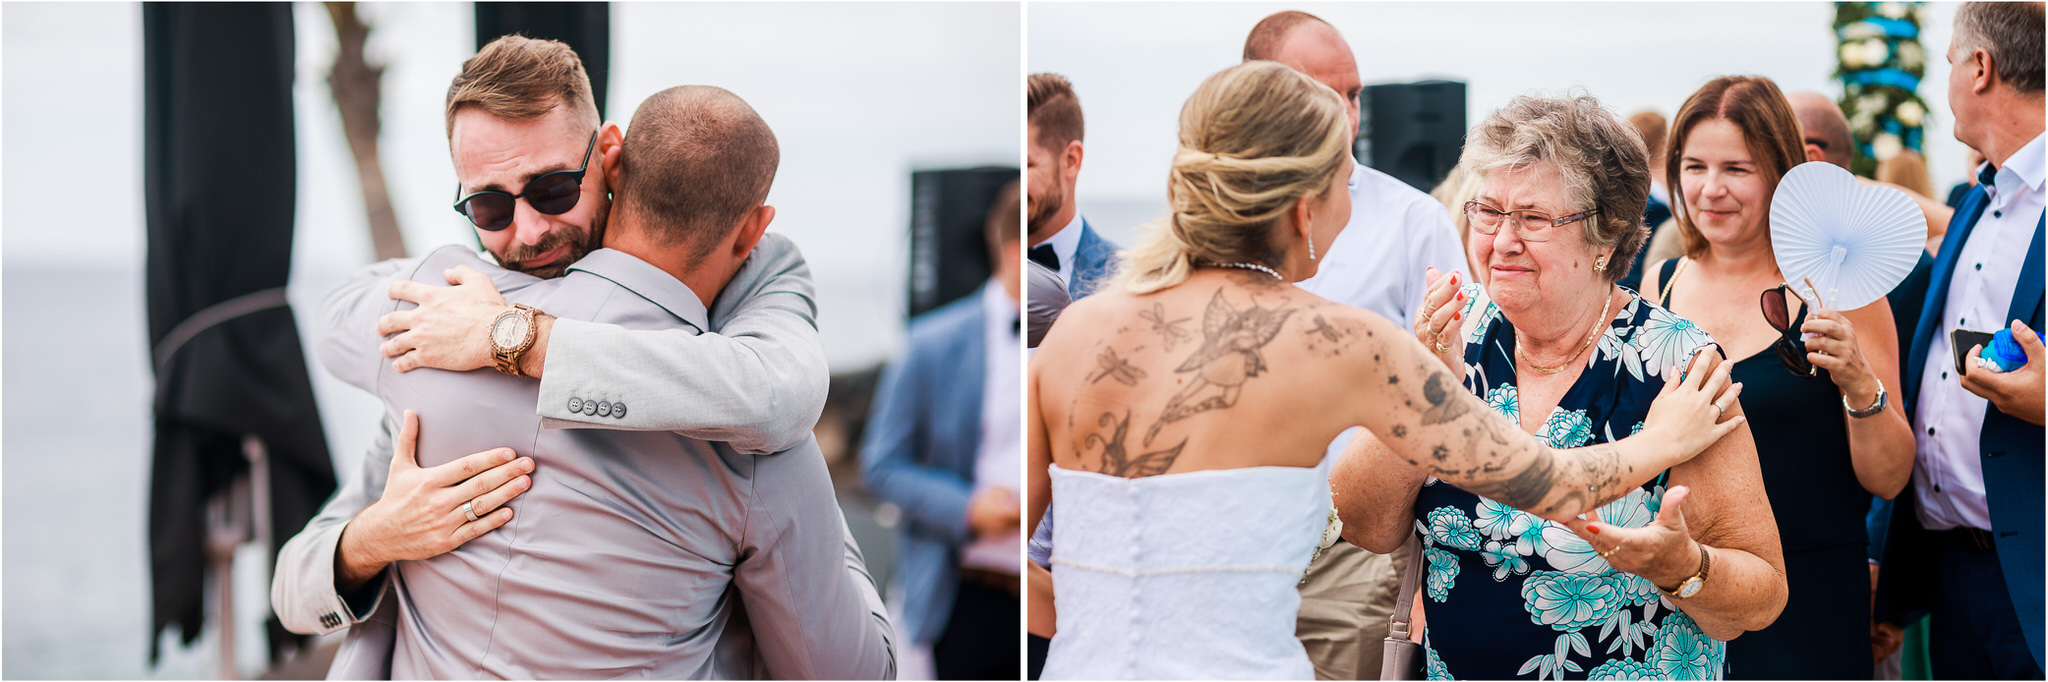 Hochzeitsfoto-Teneriffa-29.jpg